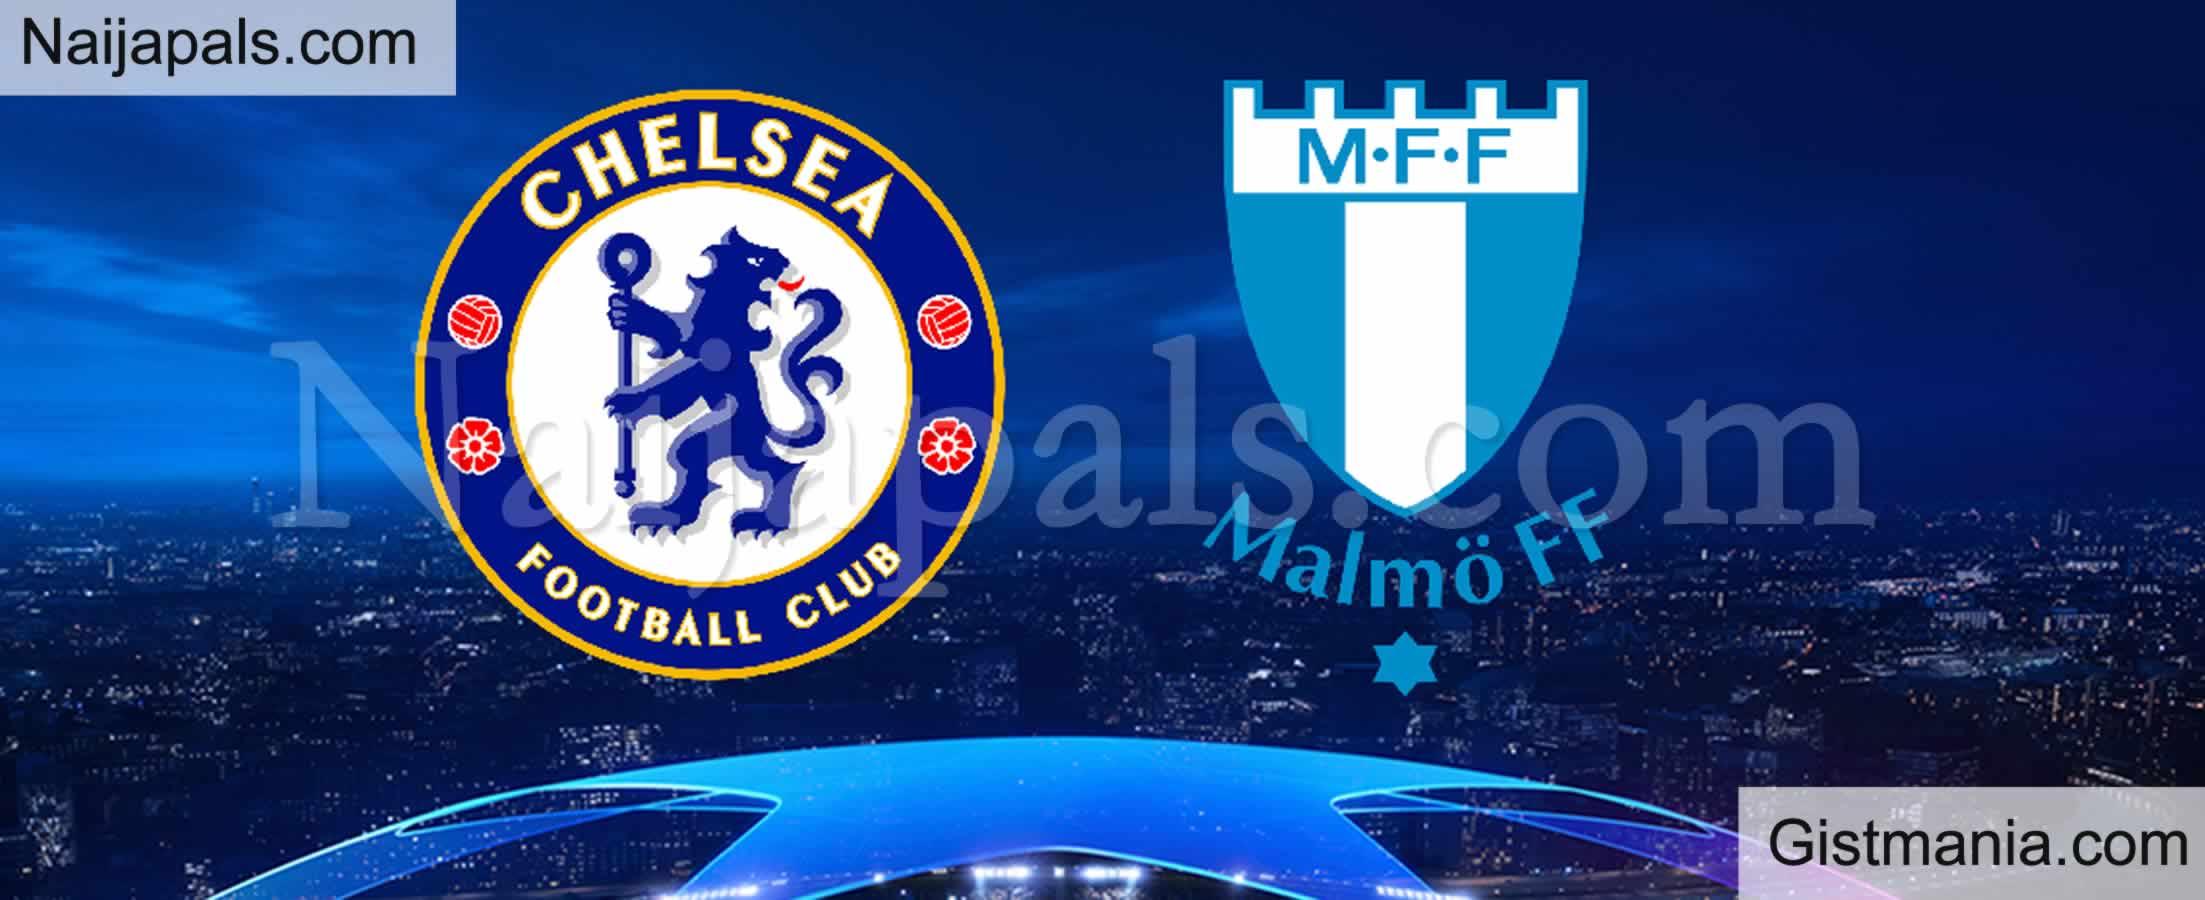 <img alt='.' class='lazyload' data-src='https://img.gistmania.com/emot/soccer.gif' /> <b>Chelsea v Malmoe : UEFA Champion's League Match, Team News, Goal Scorers and Stats</b>